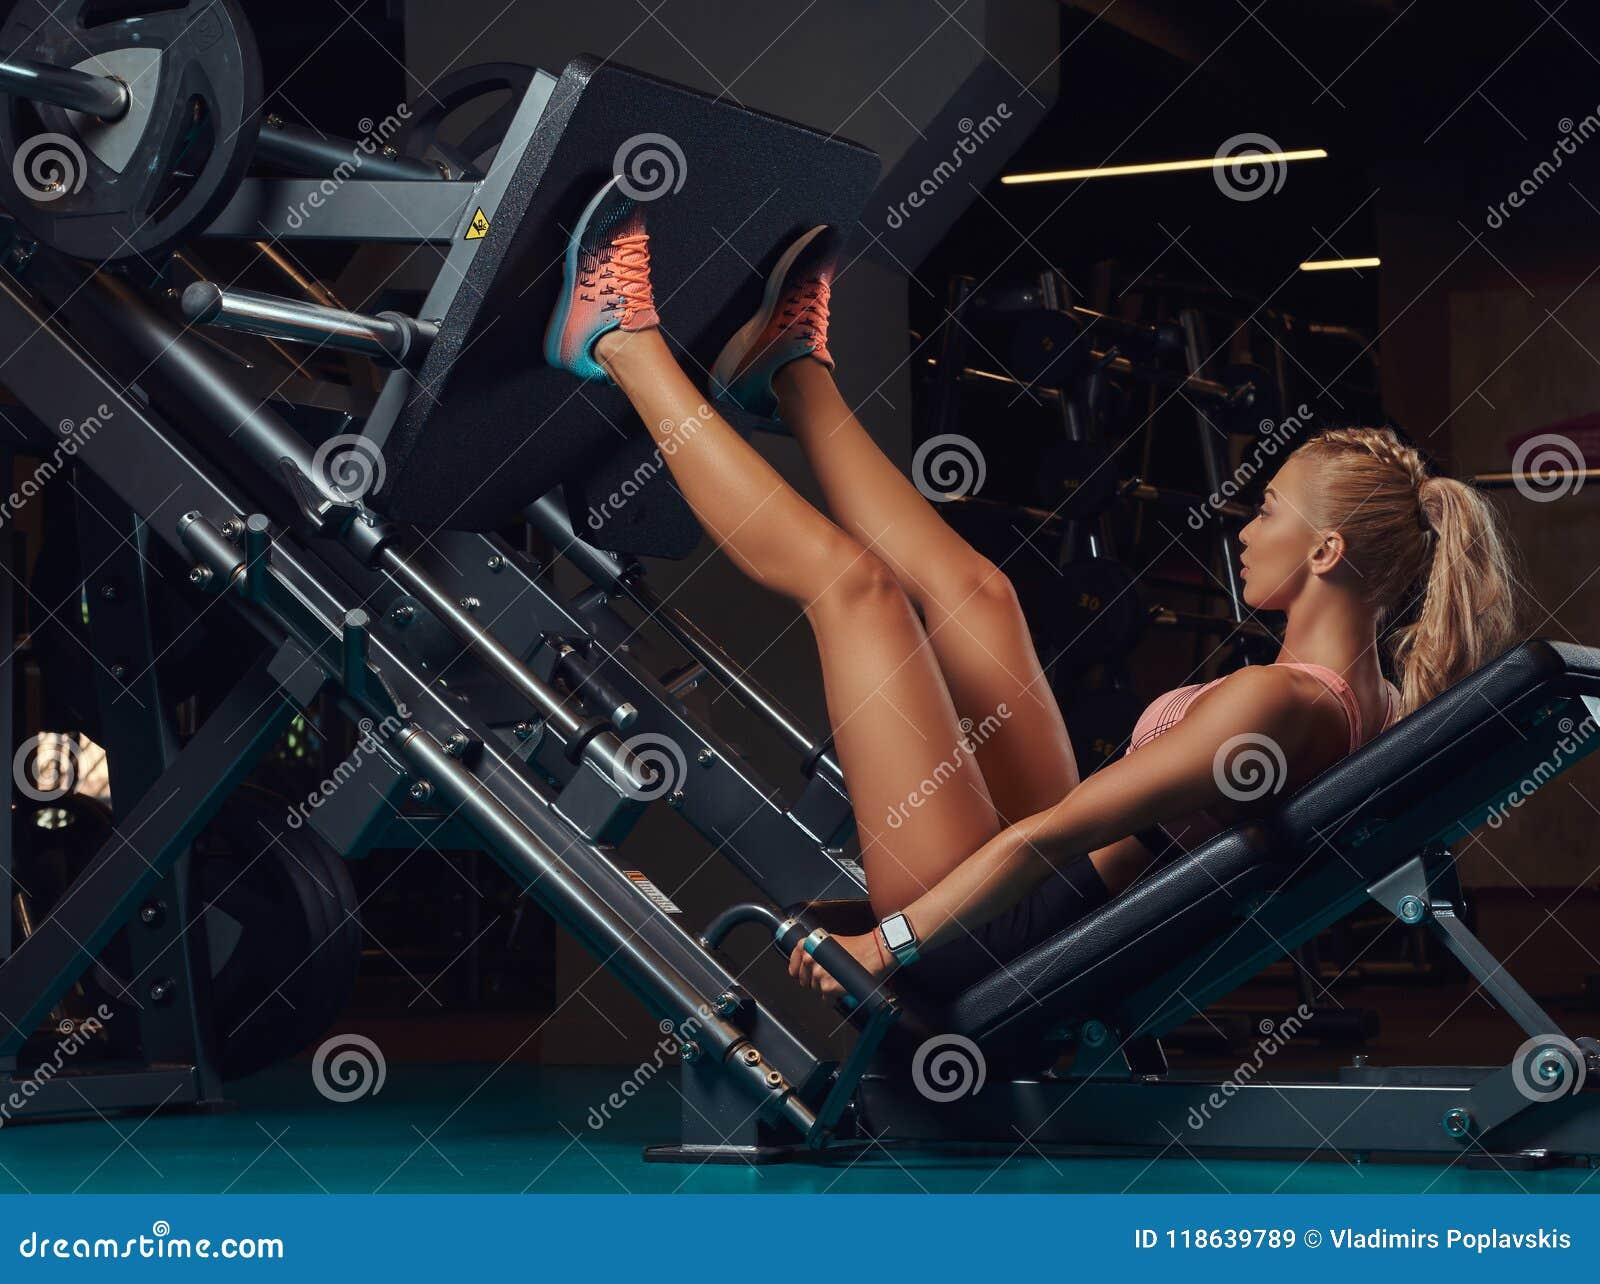 Beautifull做在腿的运动服的健身妇女锻炼按在健身房的机器